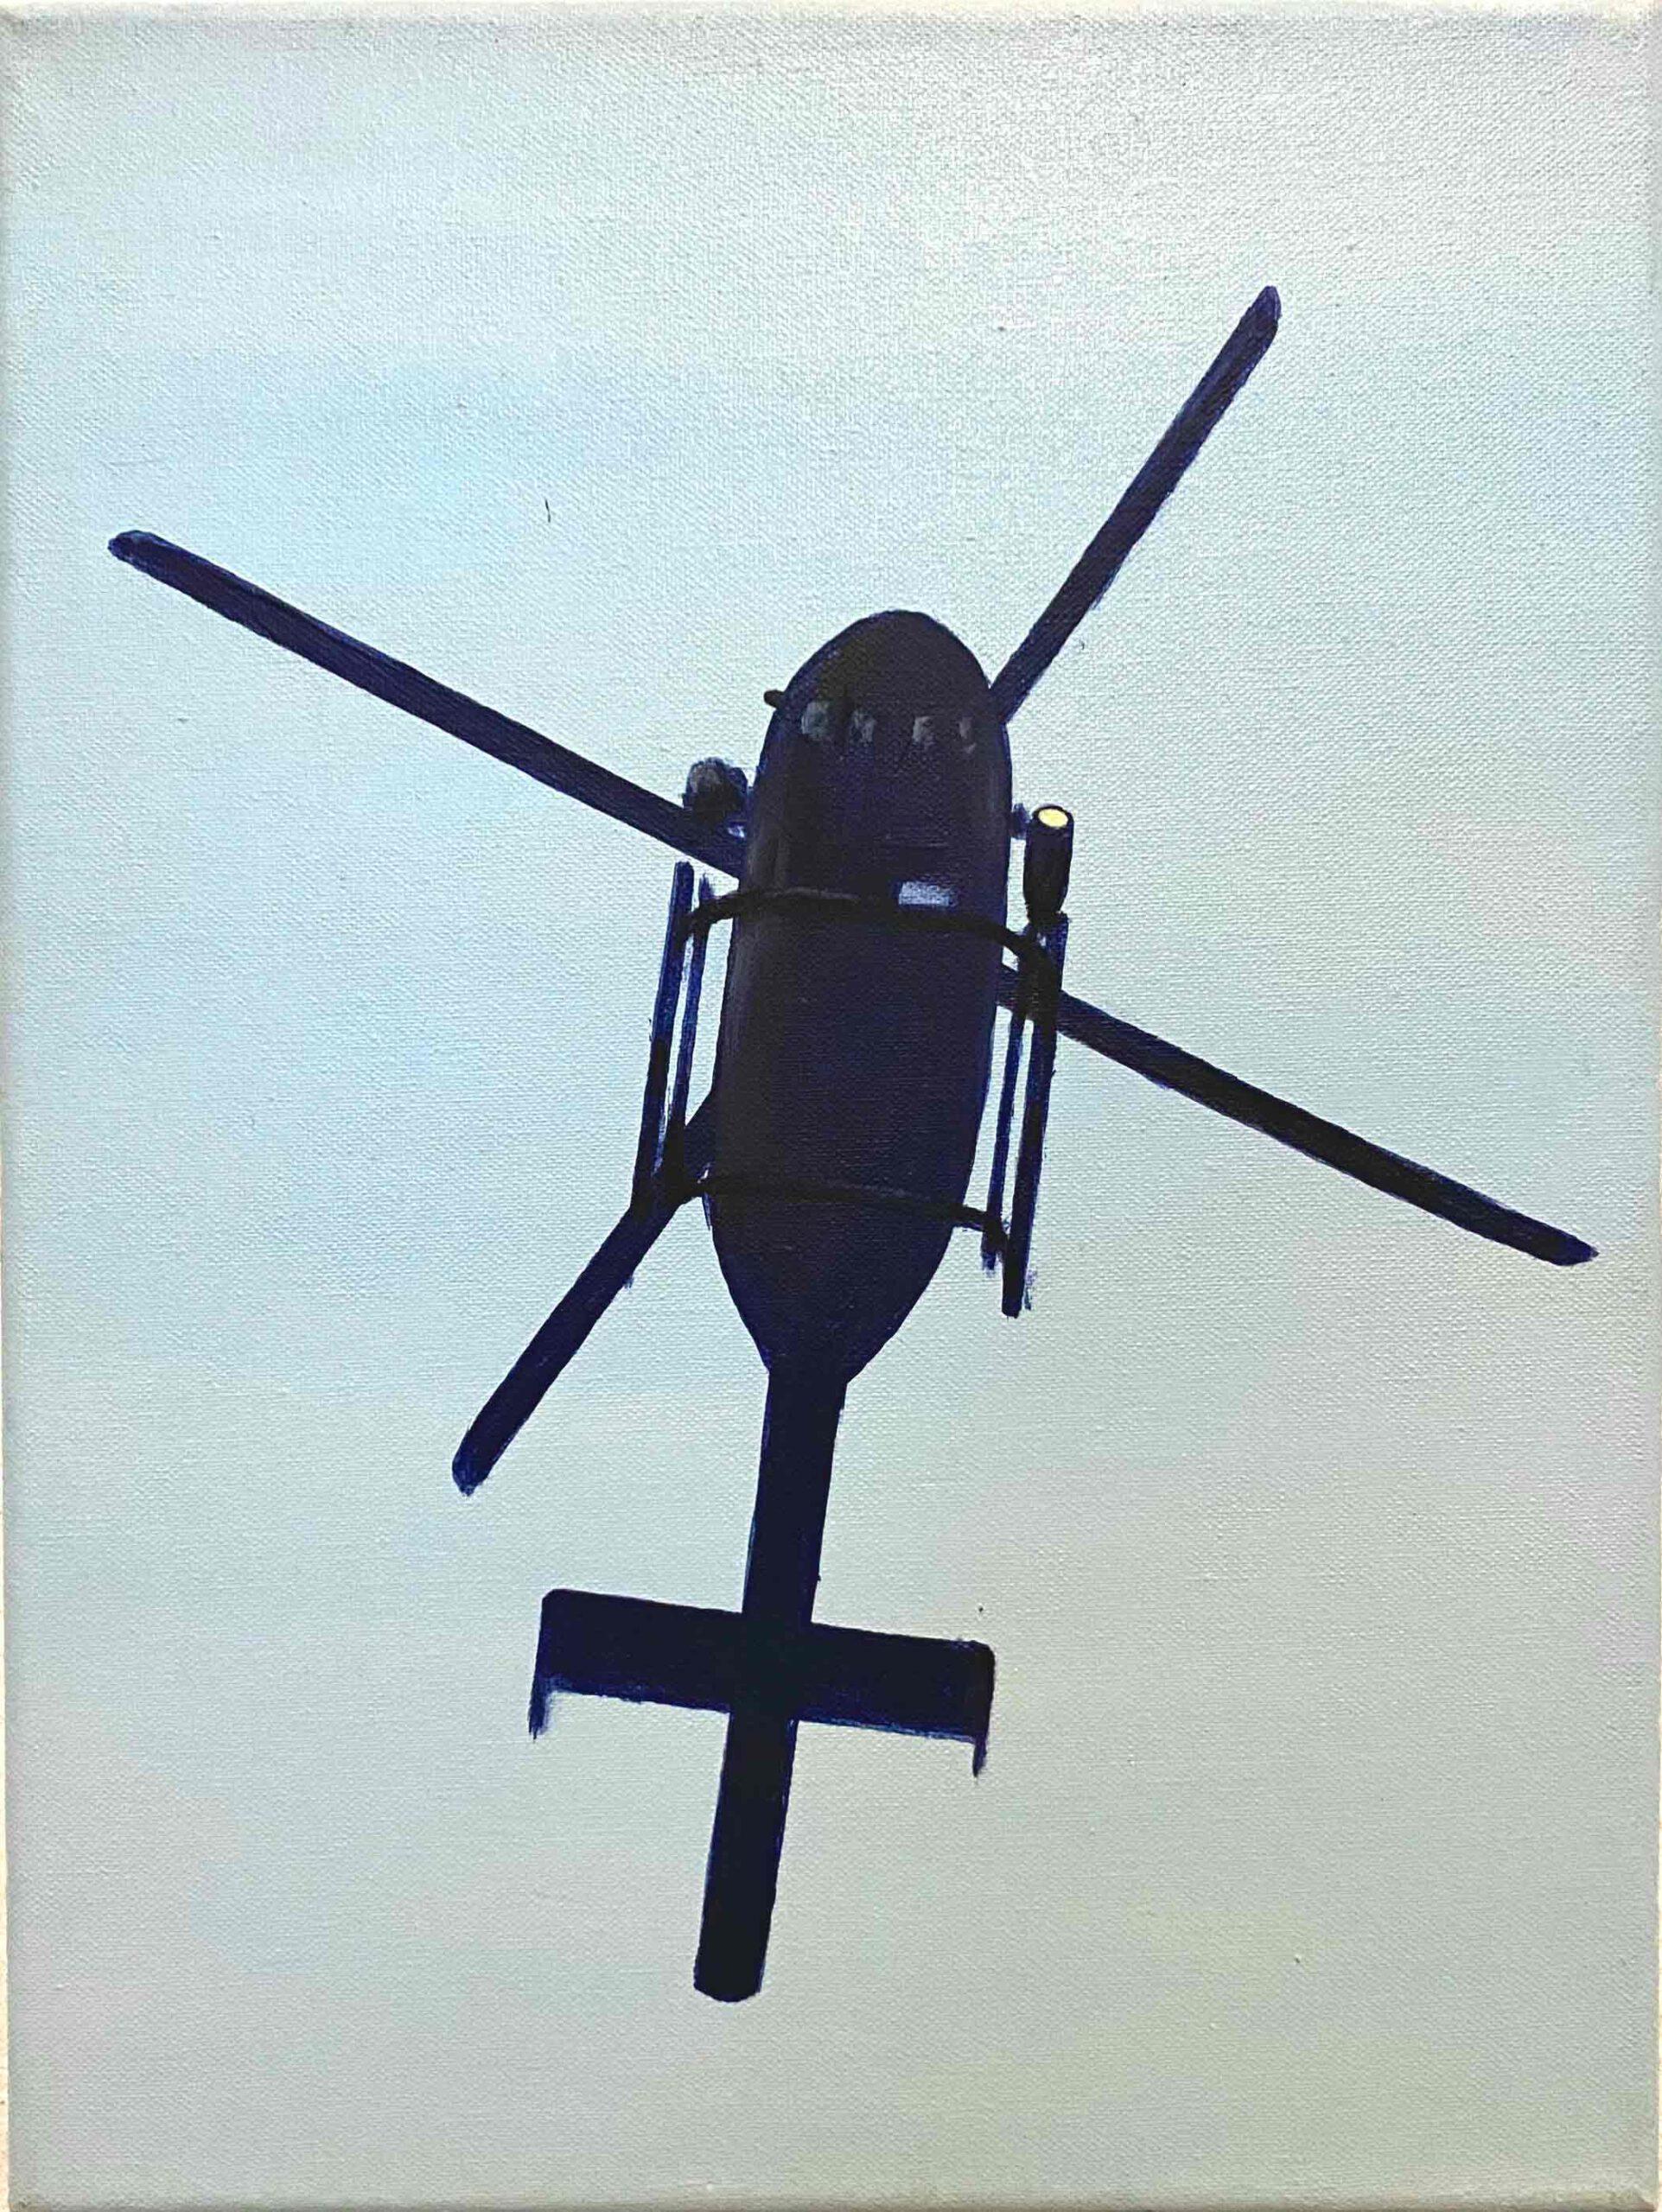 """Helicopter VIII"" 40 x 30 cm, Öl und Acryl auf Leinwand, Felix Rieger 2017"